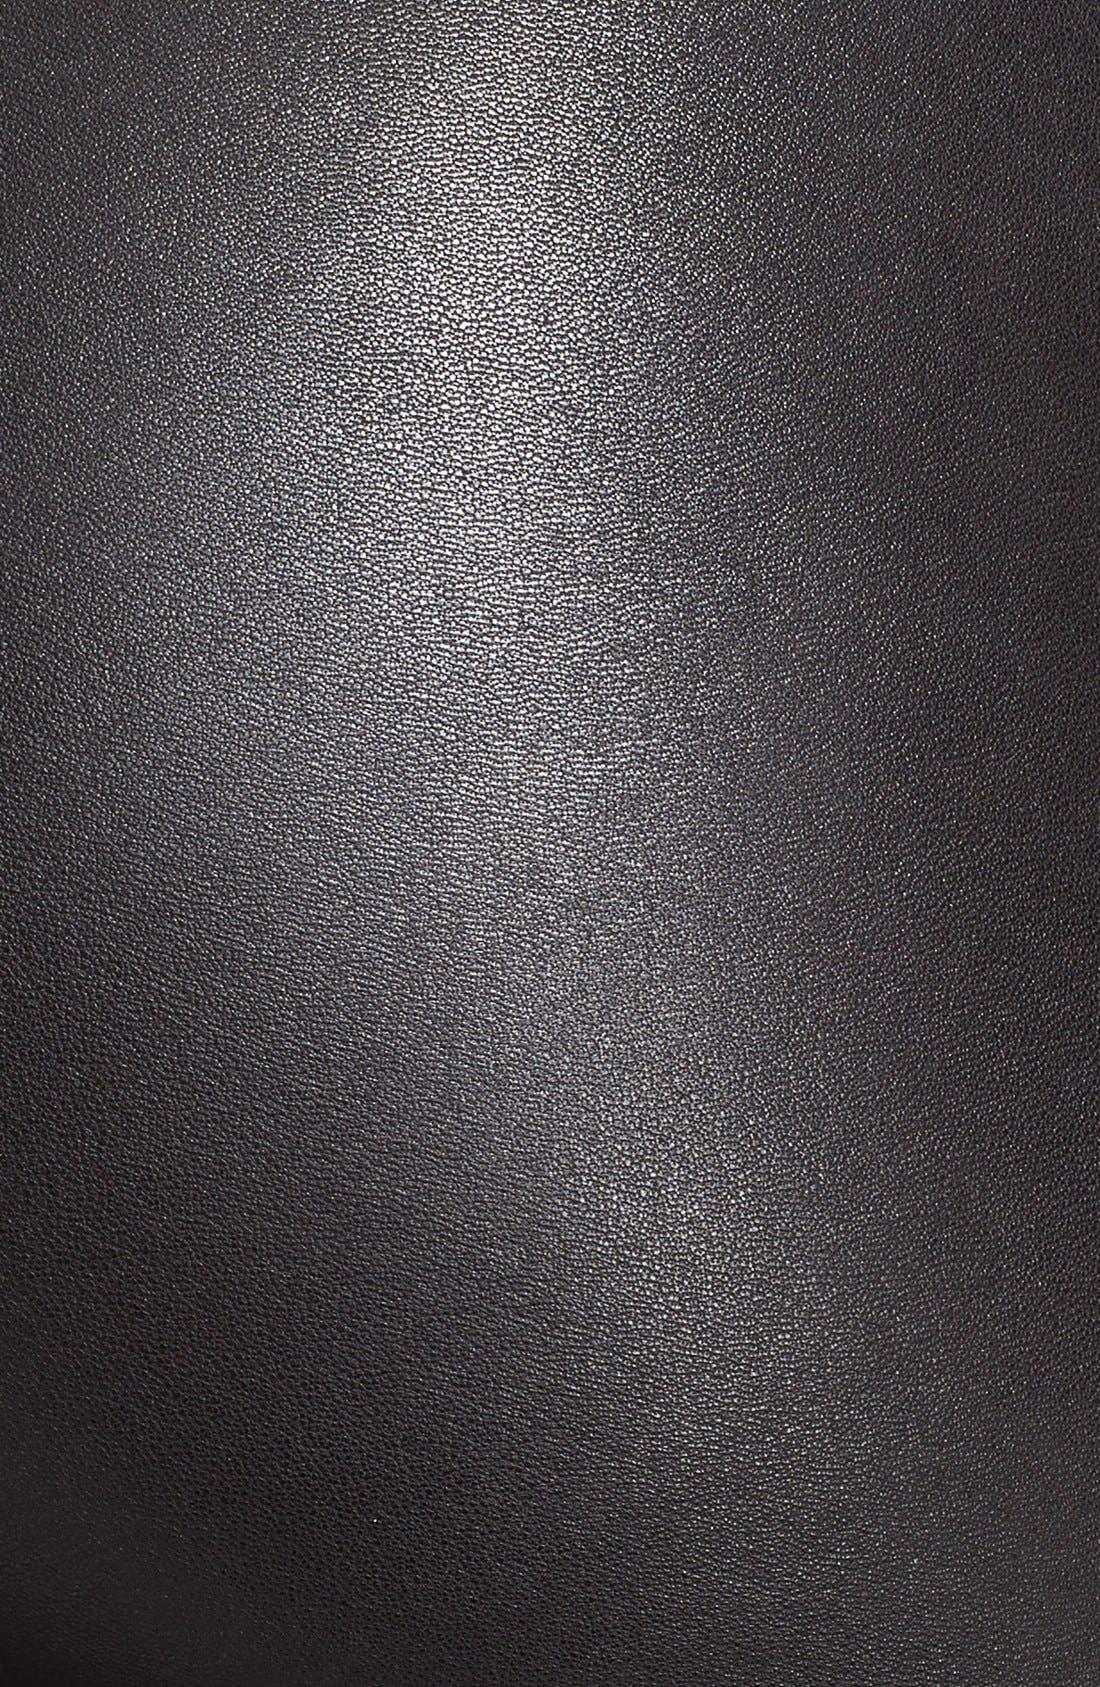 ALICE + OLIVIA, Leather Leggings, Alternate thumbnail 11, color, BLACK